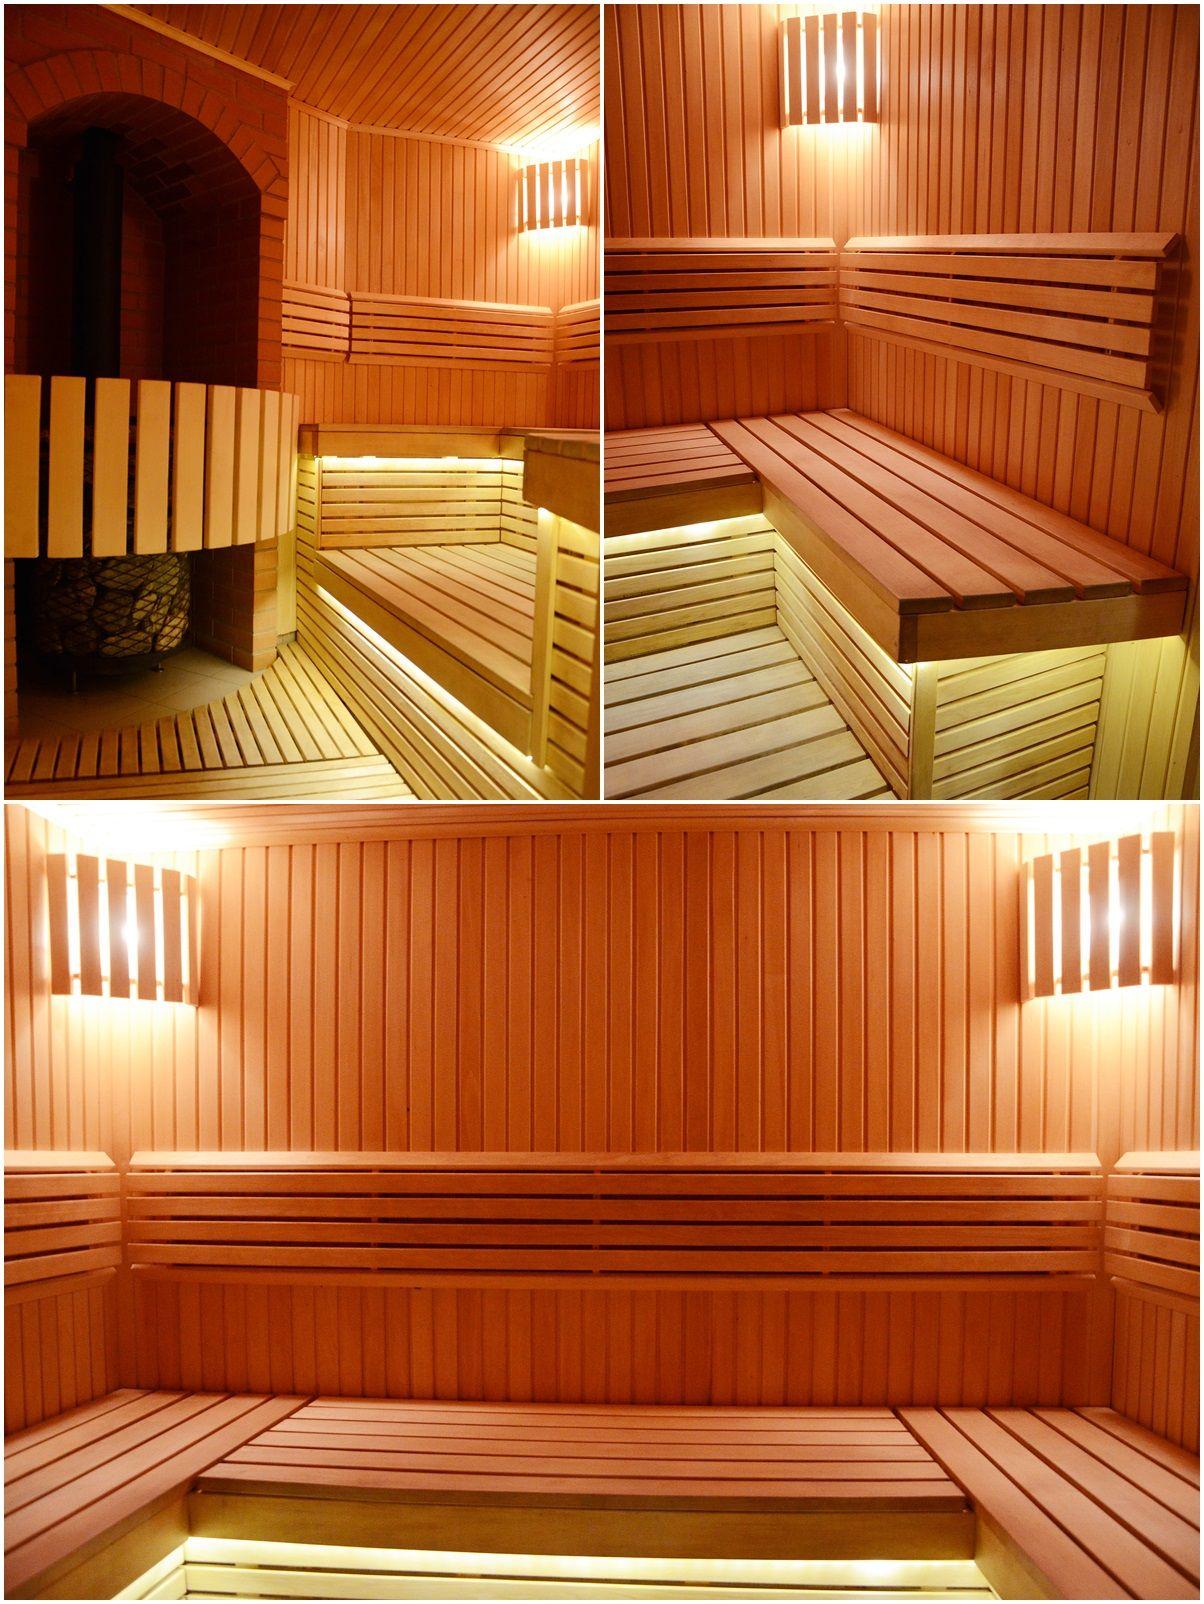 Sauna Walls And Benches Were Made From Highest Quality Linden Wood Estonian Tatpar Heater Gabrio Diabase And Talkochlorit Sauna Outdoor Sauna Outdoor Living